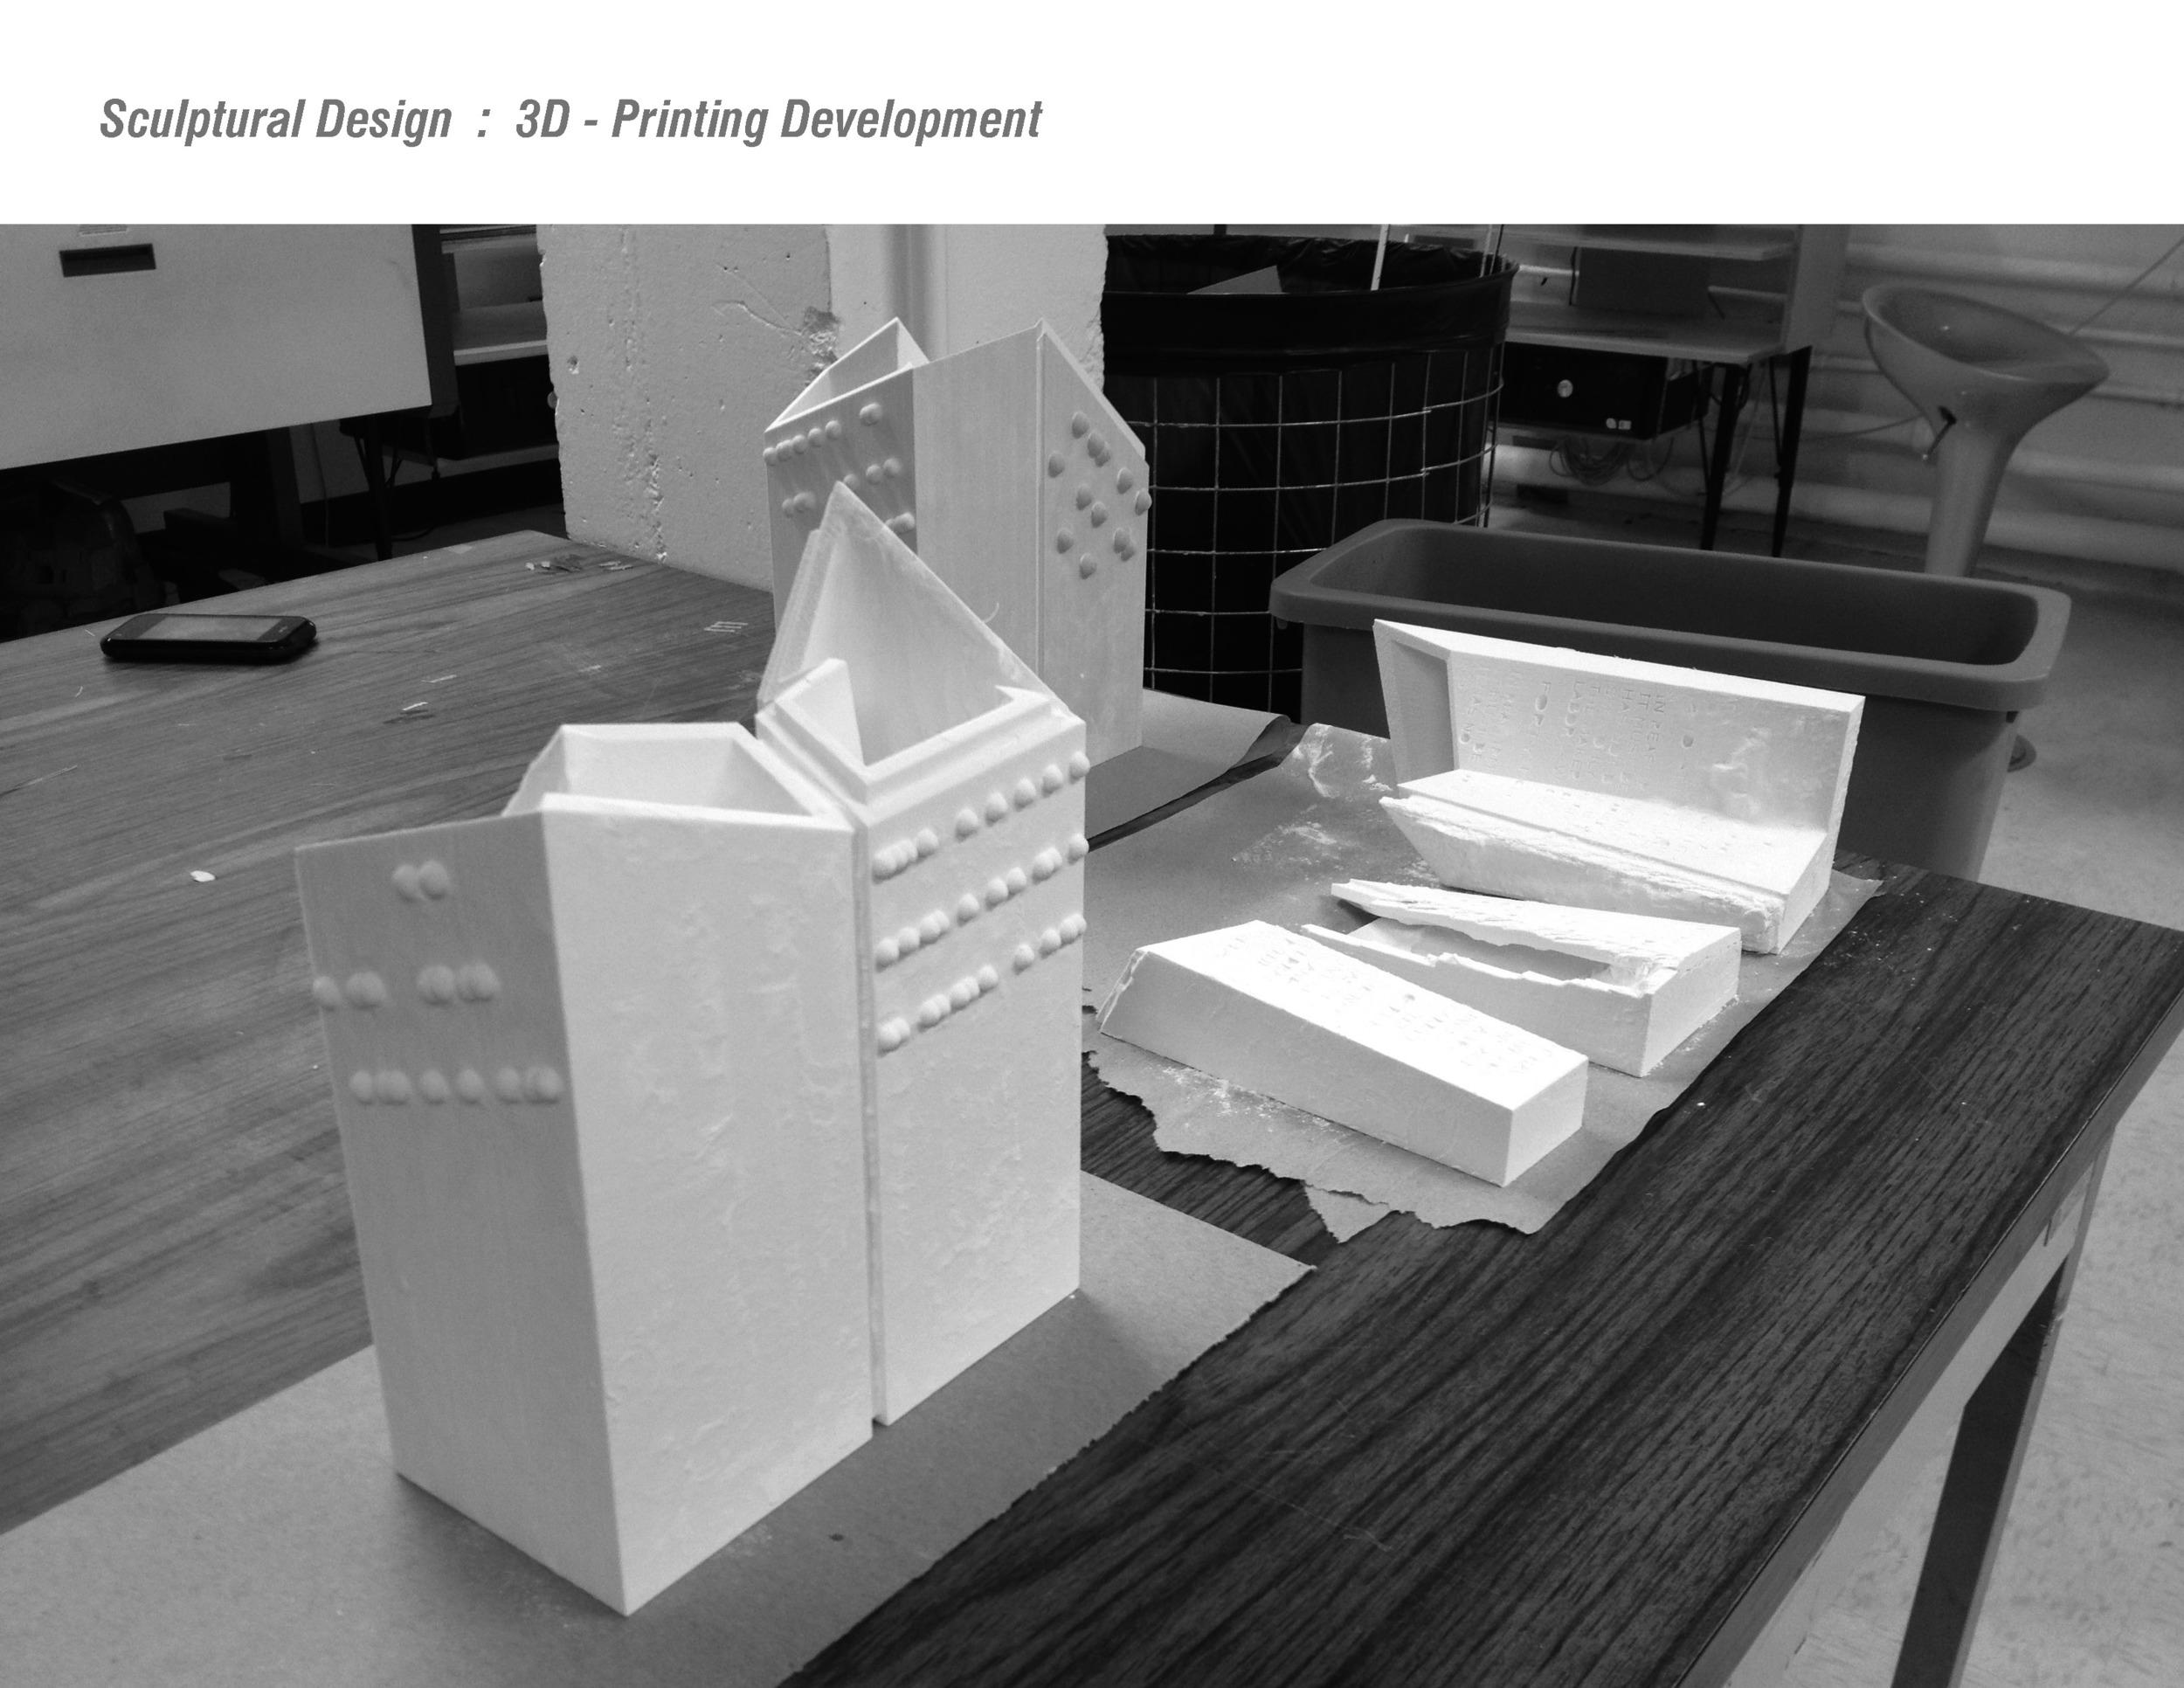 2014_0321 Matt Fajkus MF Architecture Presidential Sculpture_Page_7.jpg